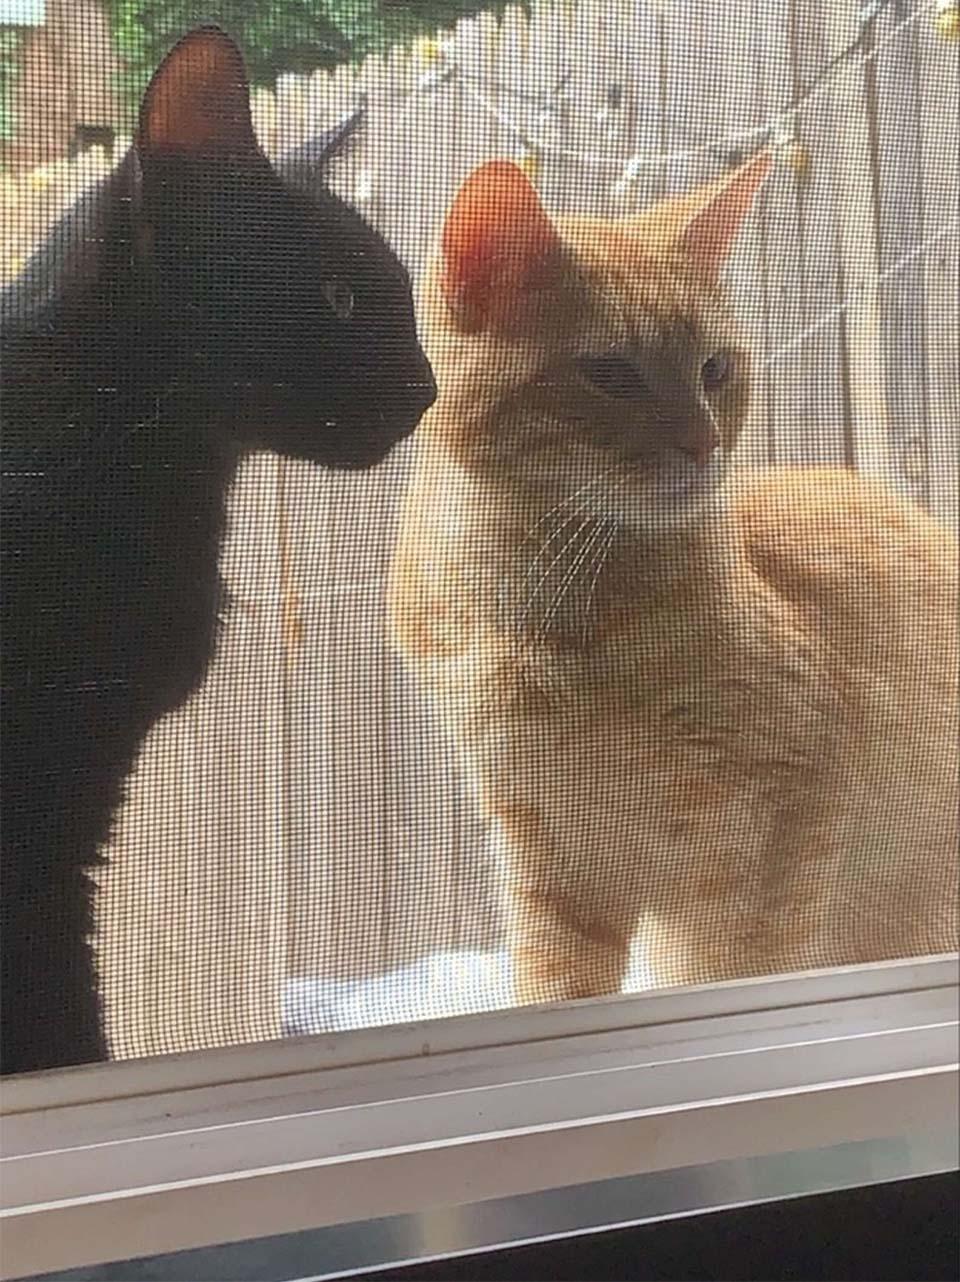 Pareja de felinos